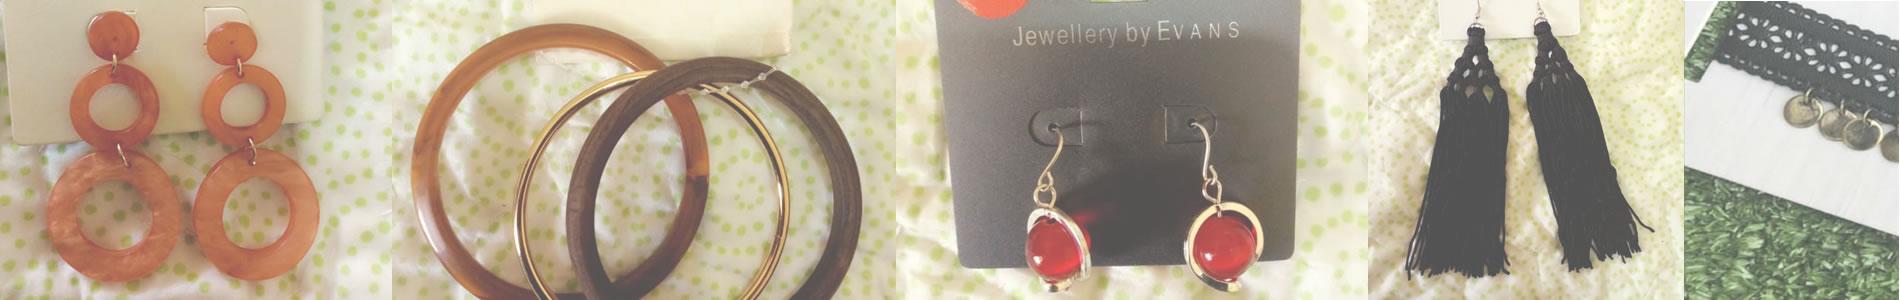 Aboks Jewellery